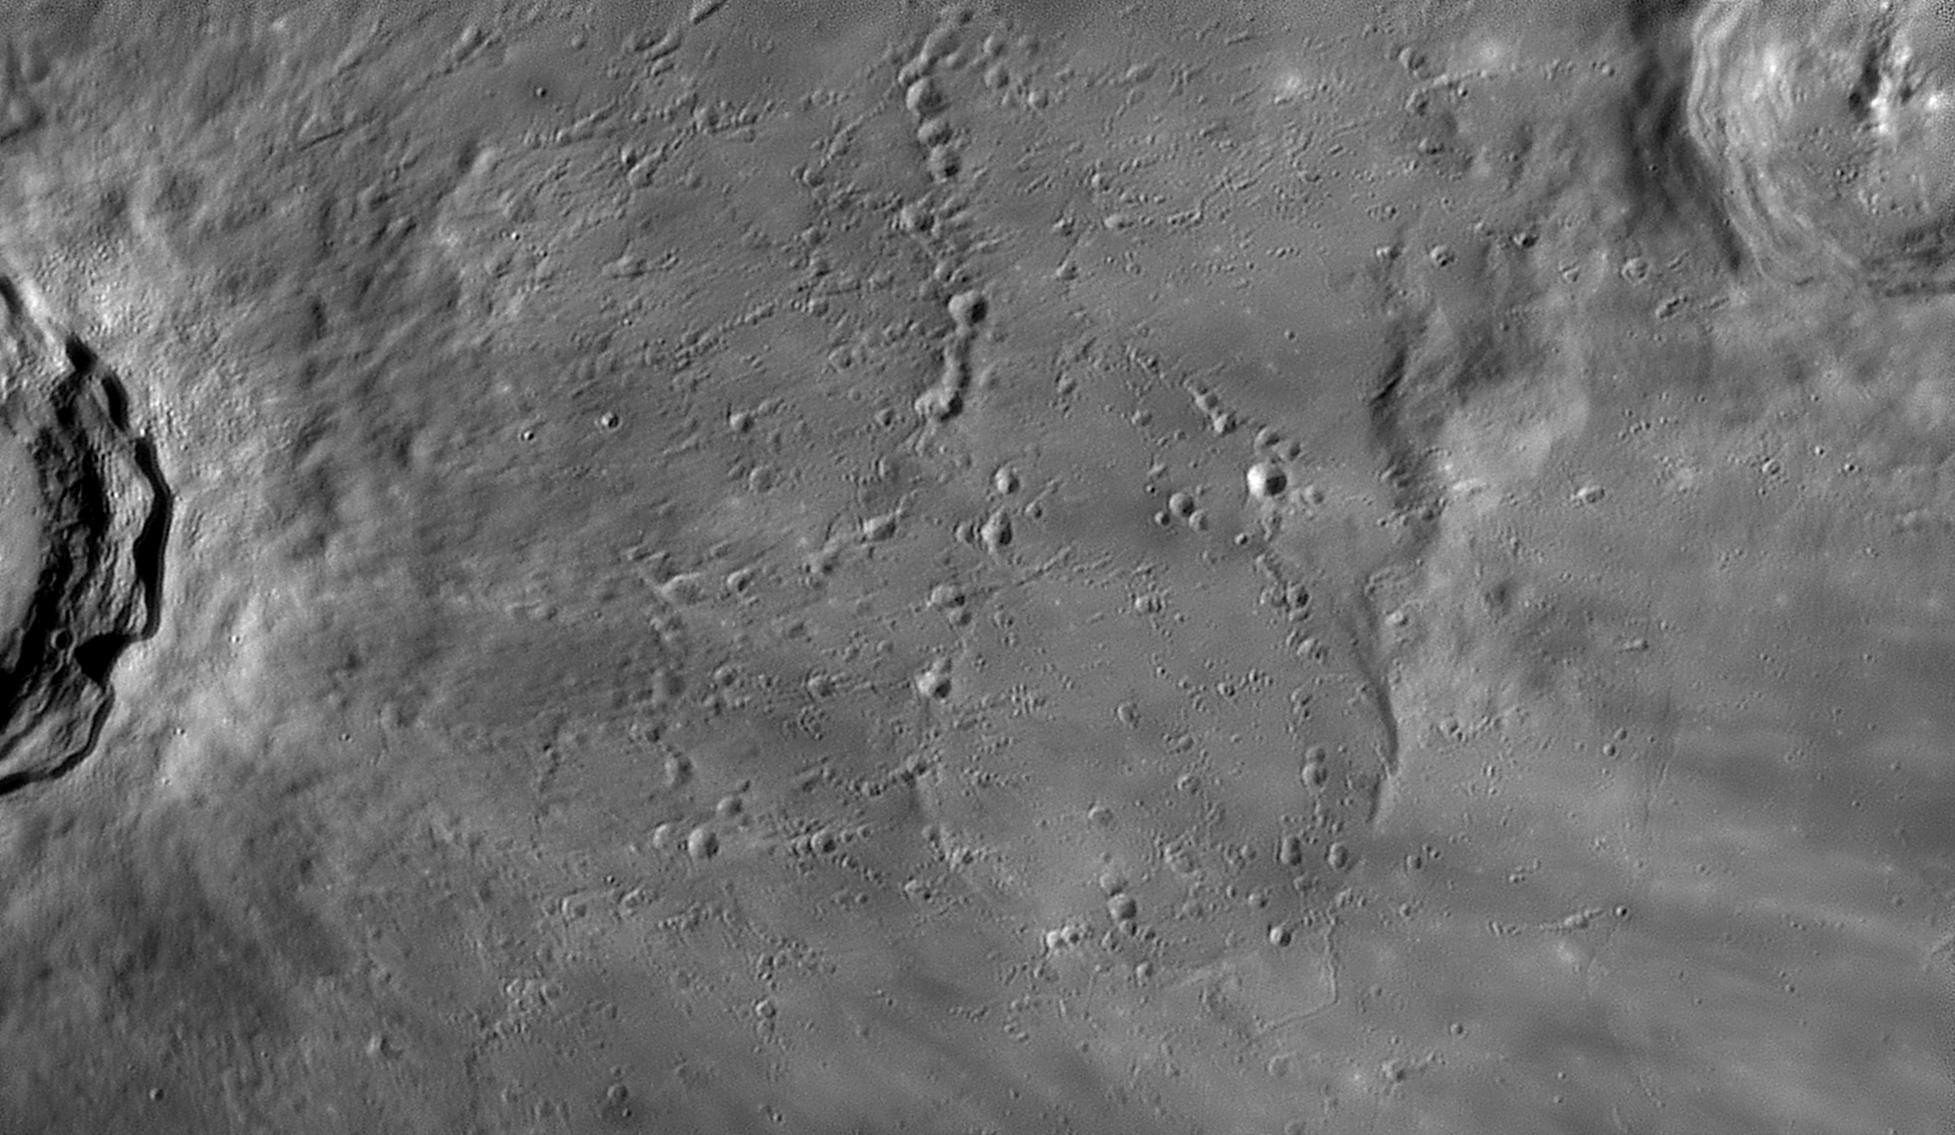 large.moon_03_04_2020_20_33-STADIUS.jpg.99d9ff4b37ca74c3813216a67ee025dd.jpg